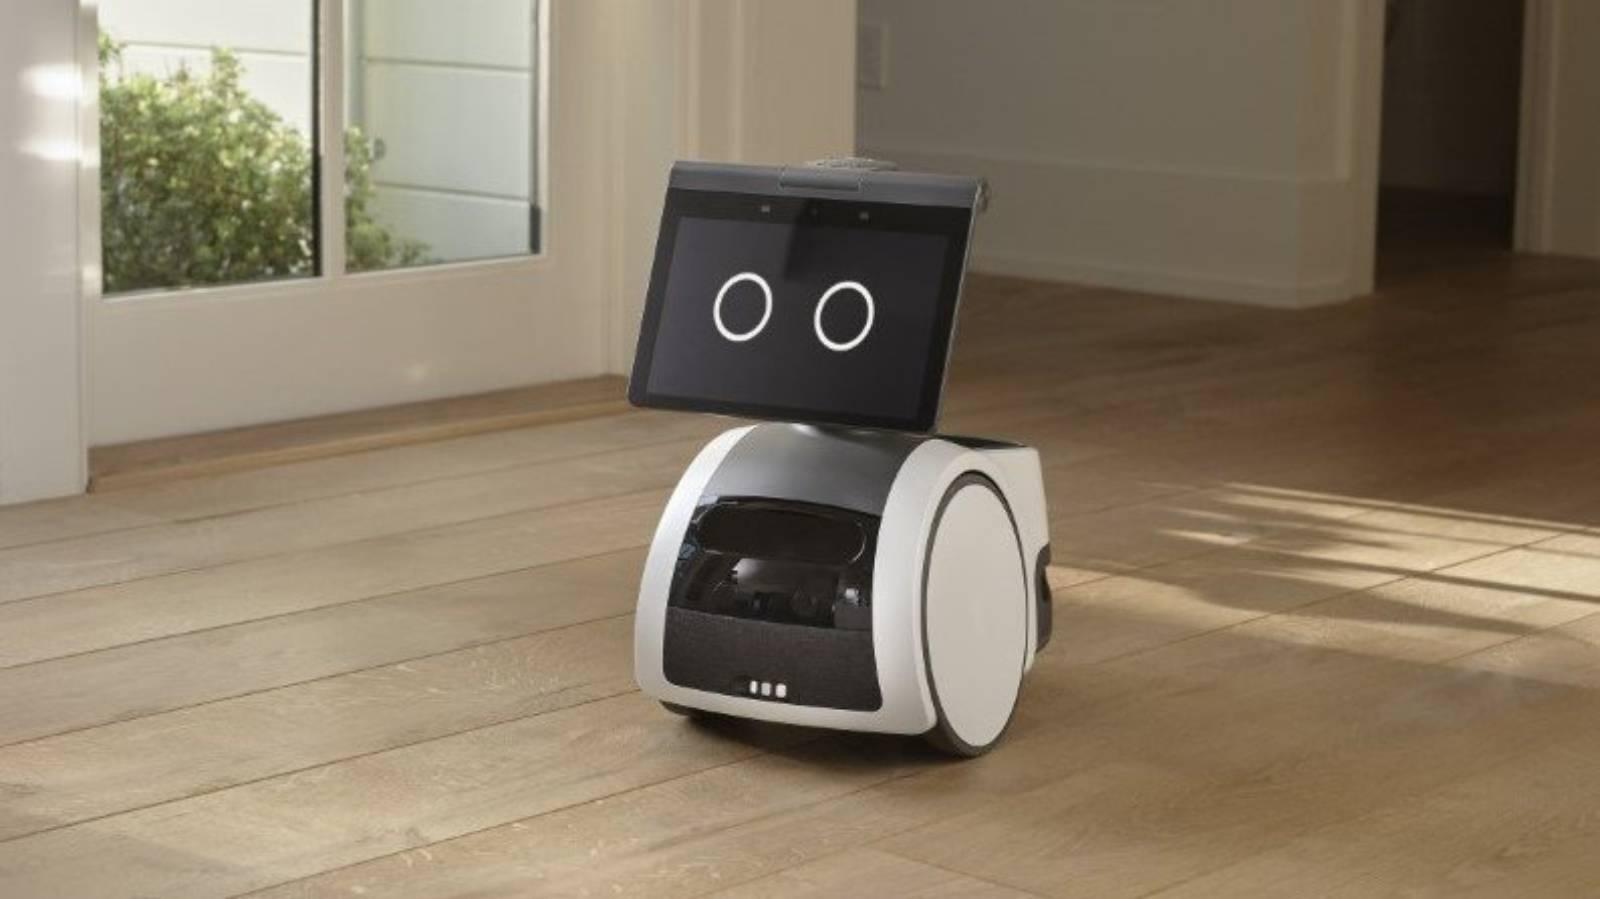 Amazon's new Wall-E-like robot